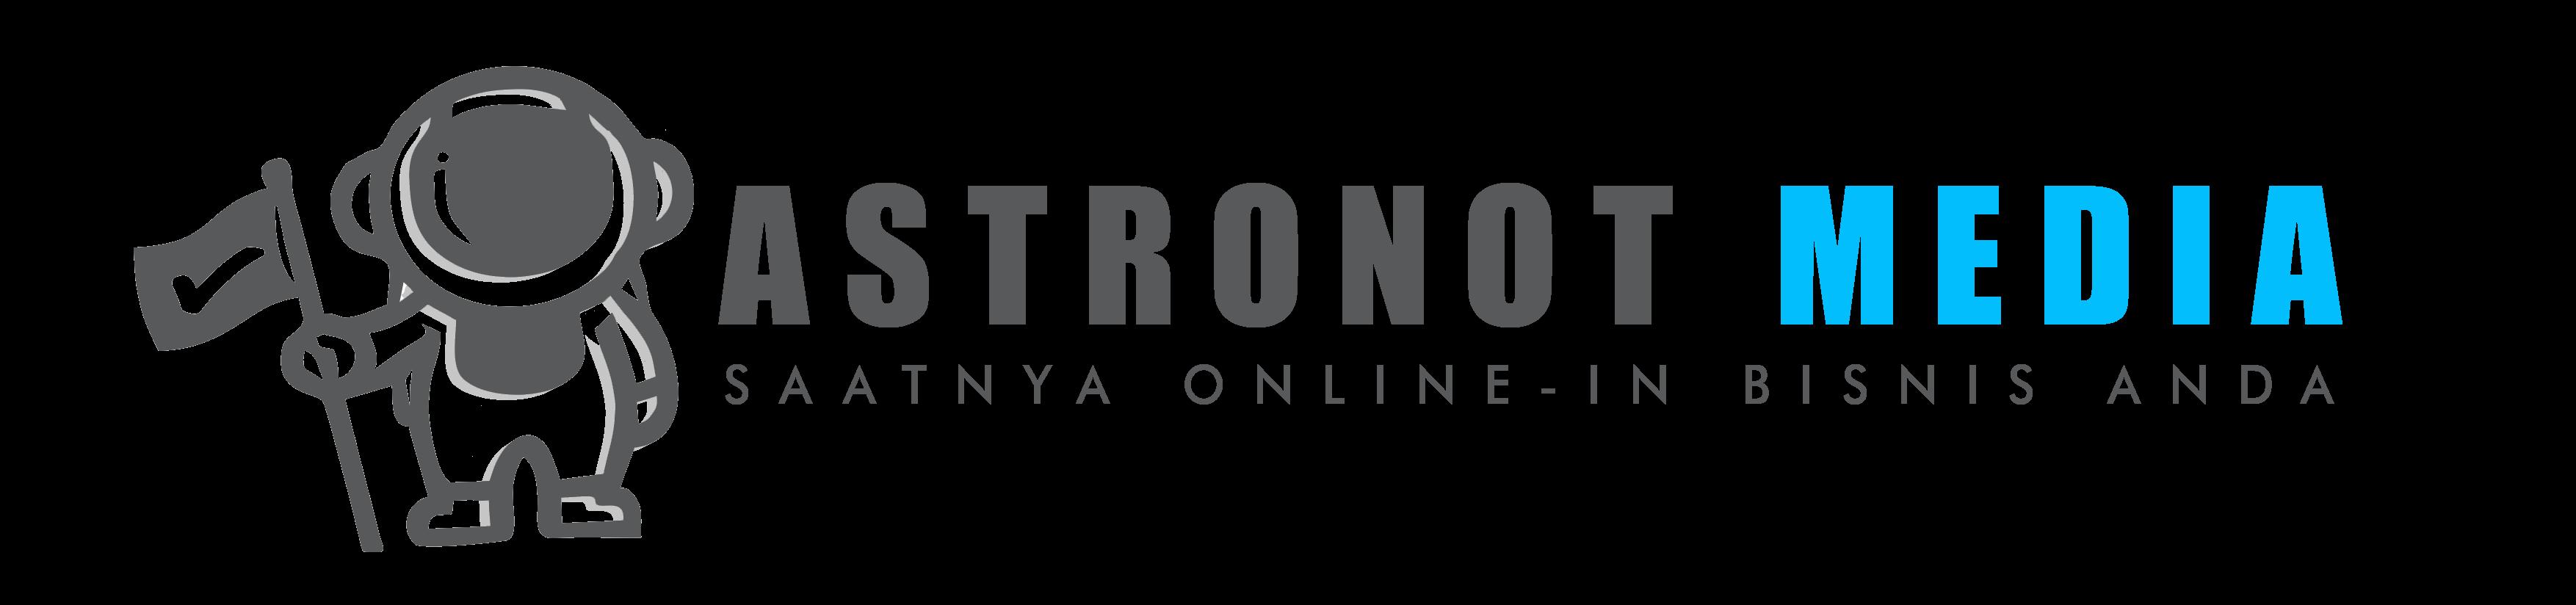 Astronotmedia